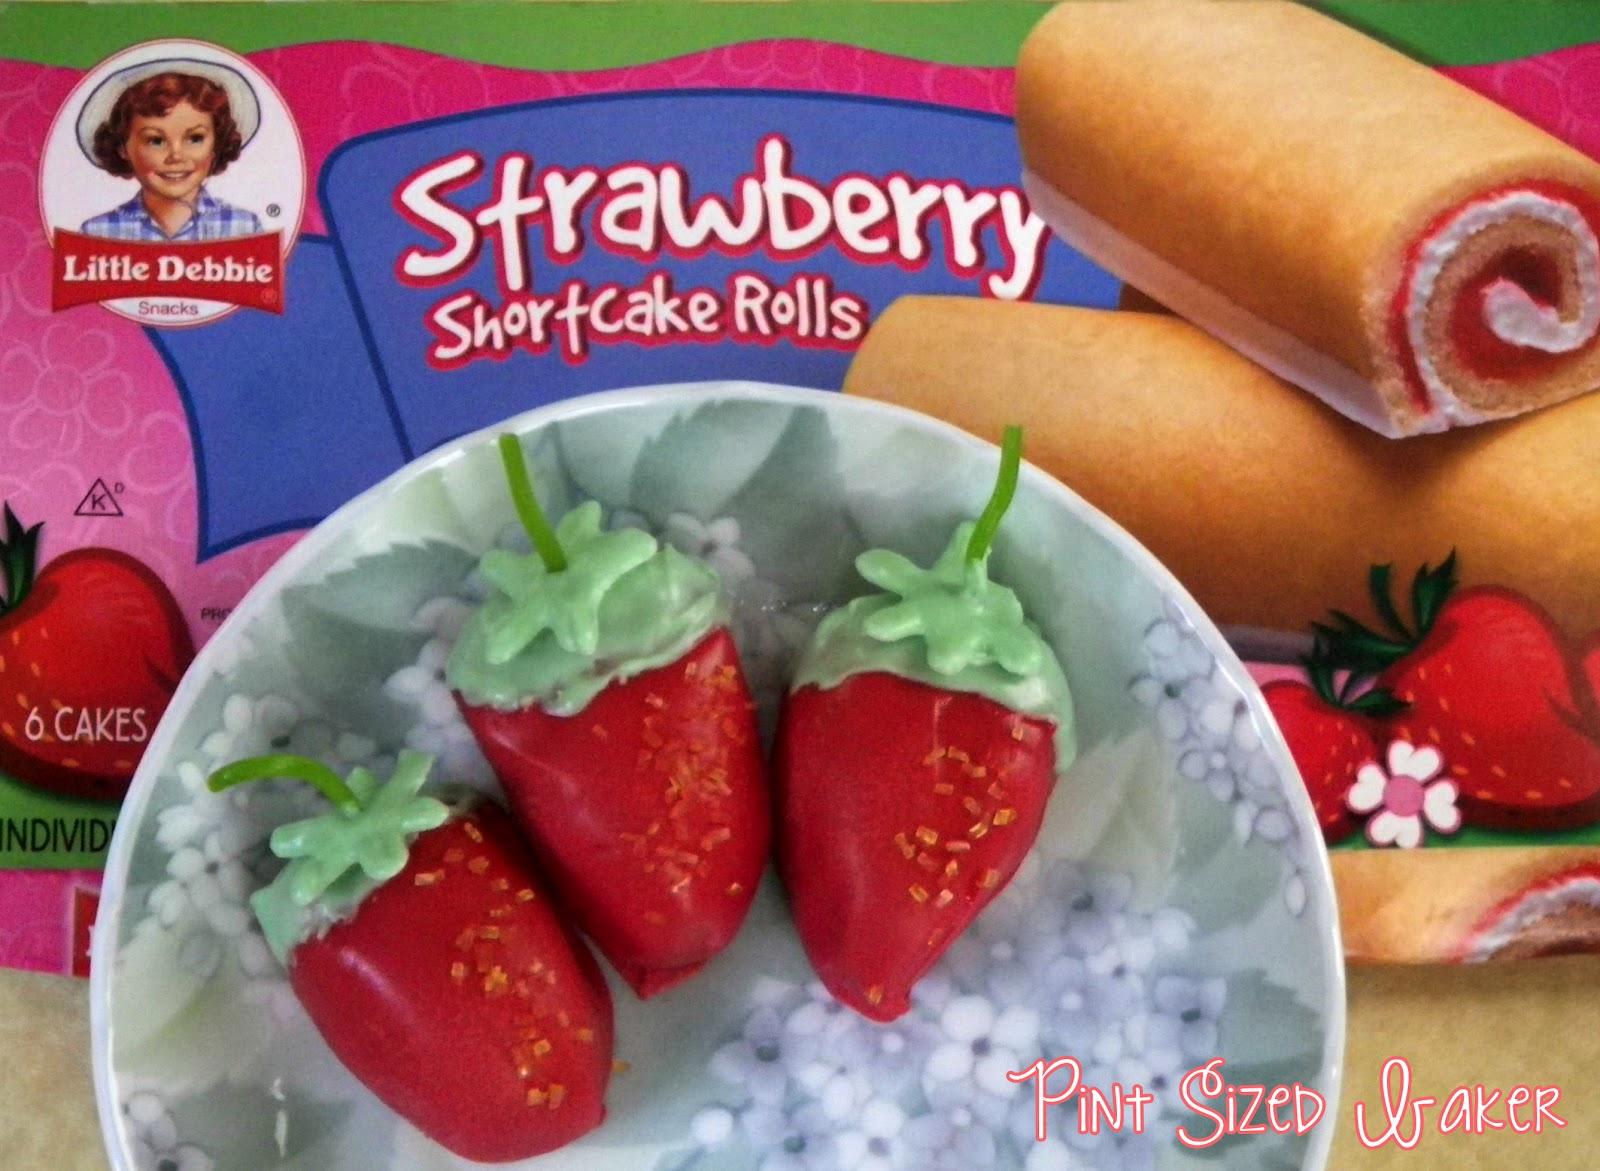 Strawberry cake recipe with frozen strawberries